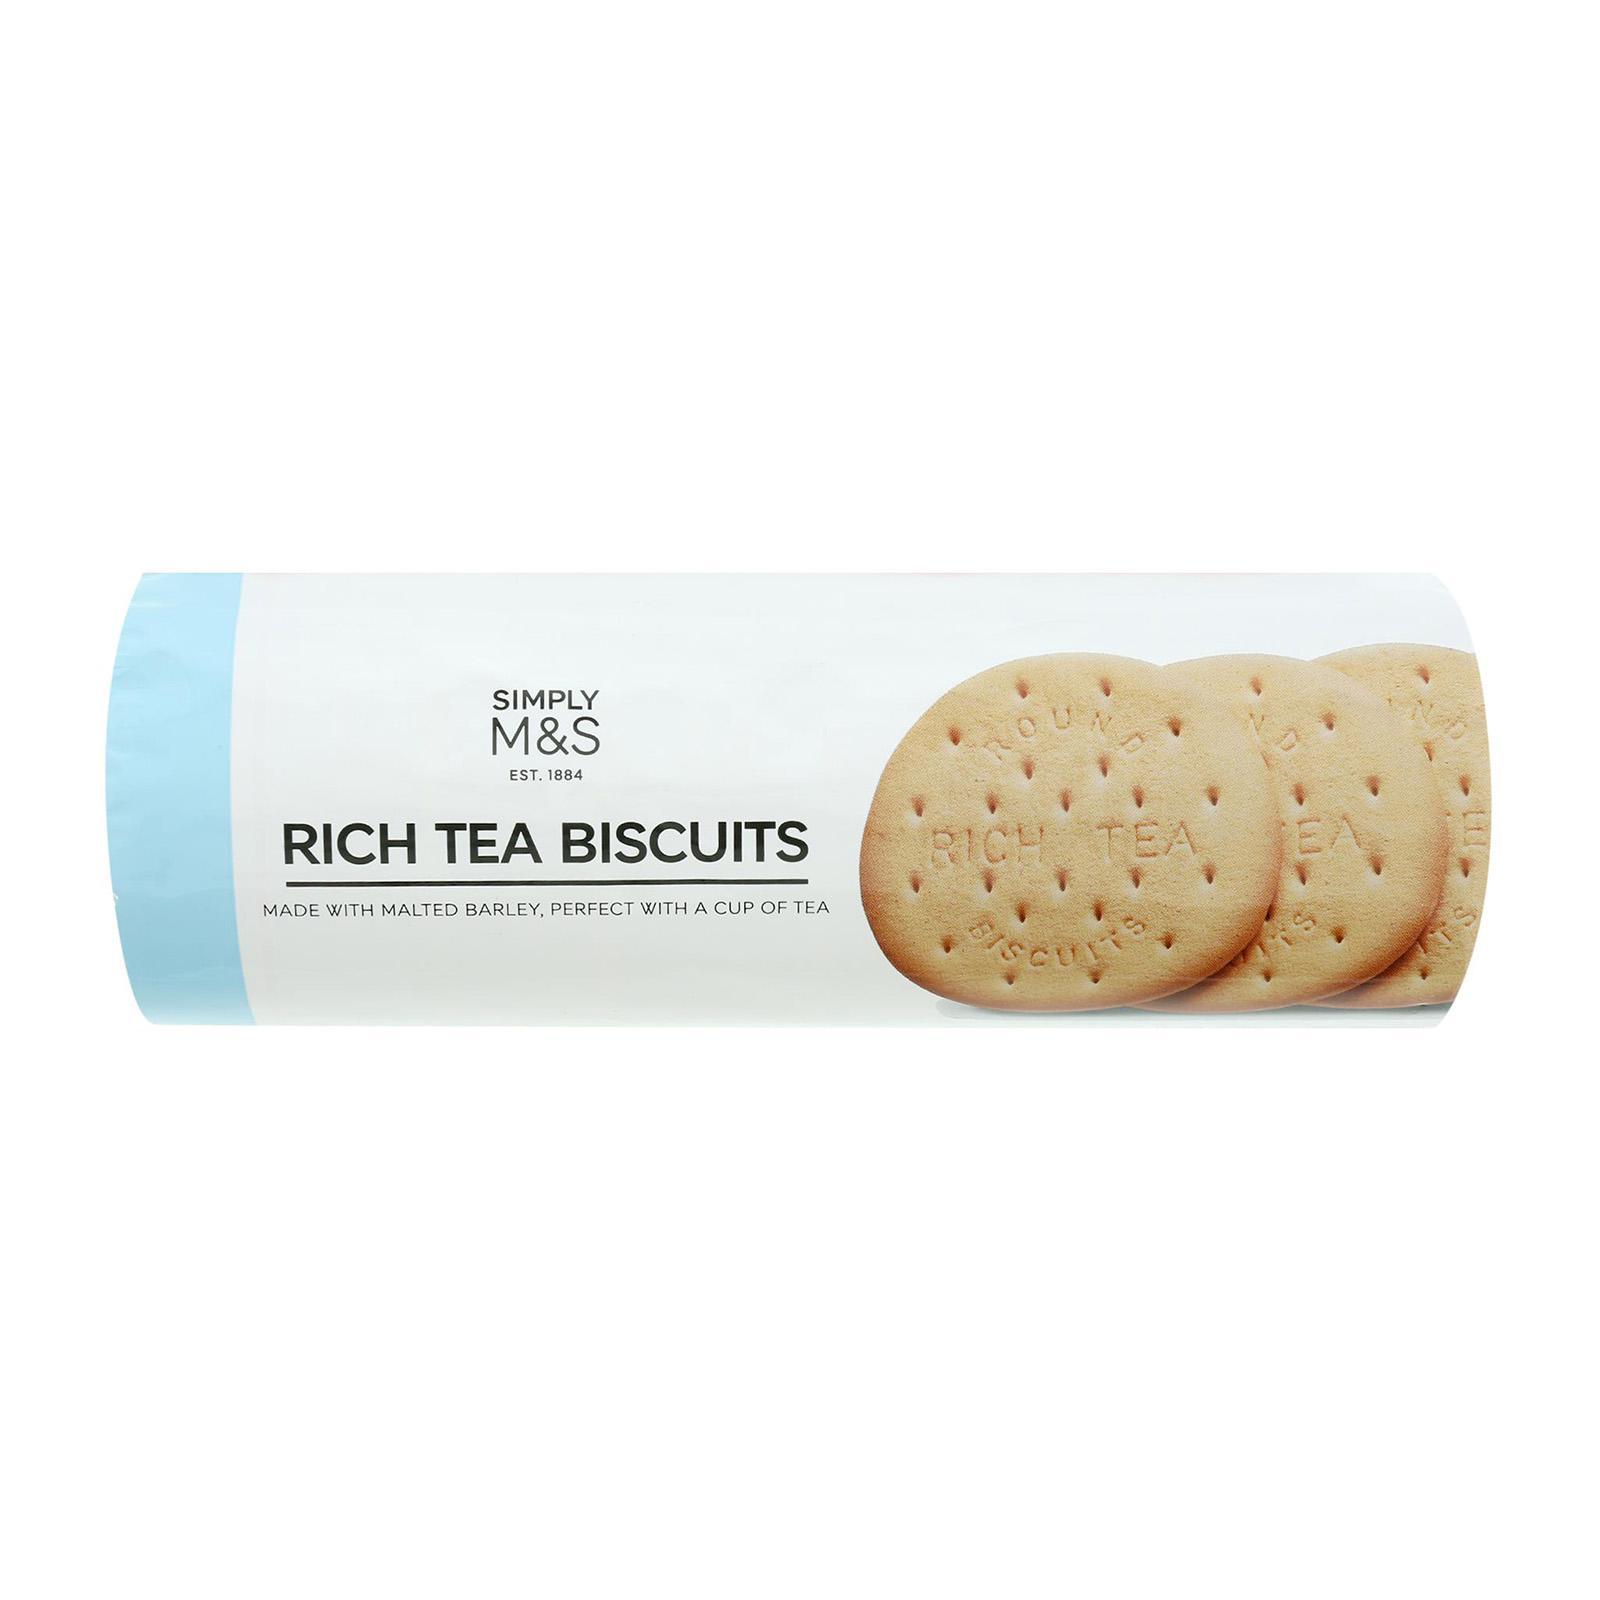 Marks & Spencer Rich Tea Biscuits